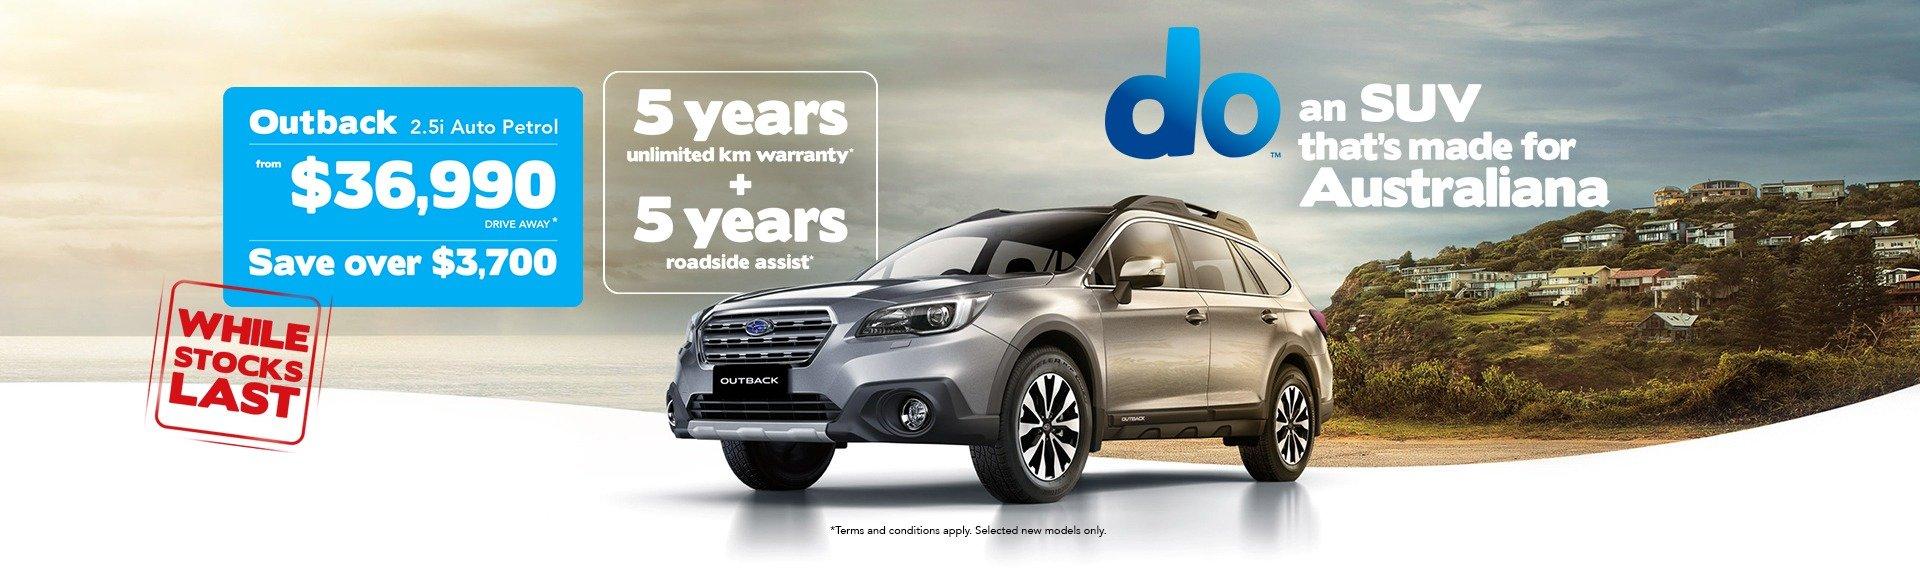 Subaru Outback Offer